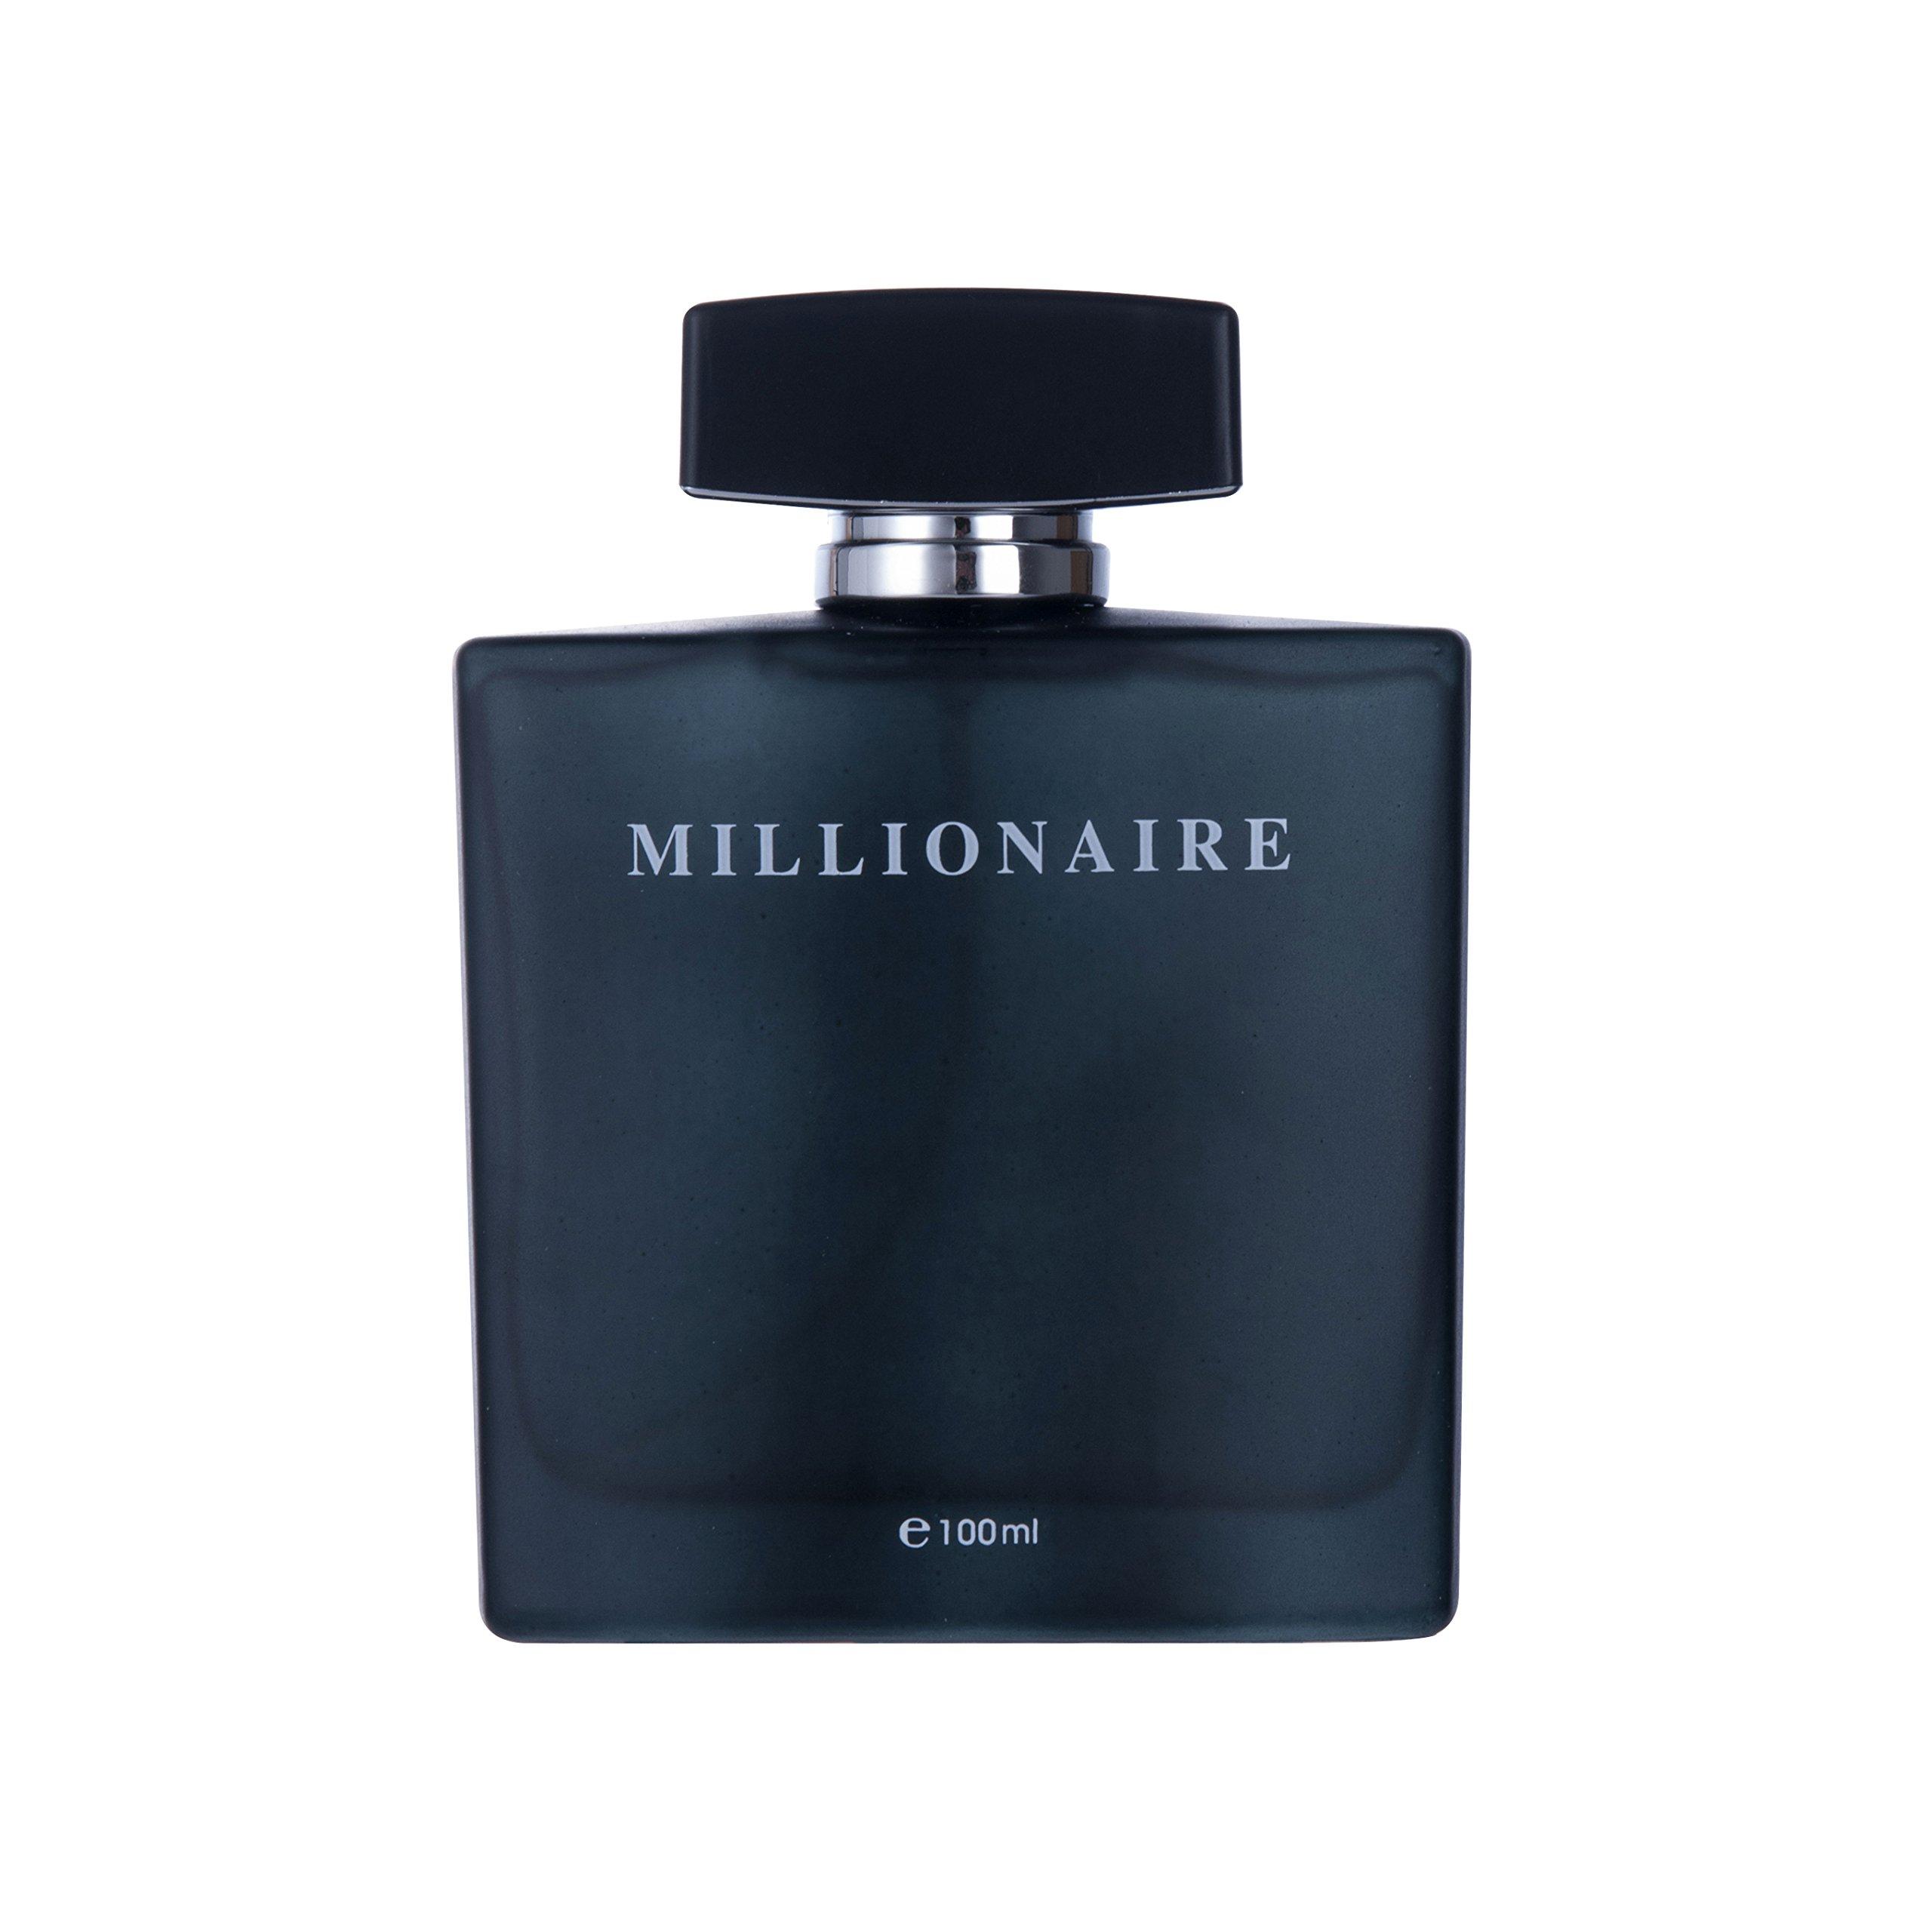 Perfume&Beauty Perfume Millionaire Eau de Parfume, 3.4 oz Spray Parfume for Men 100 ML Black Beauty Perfume